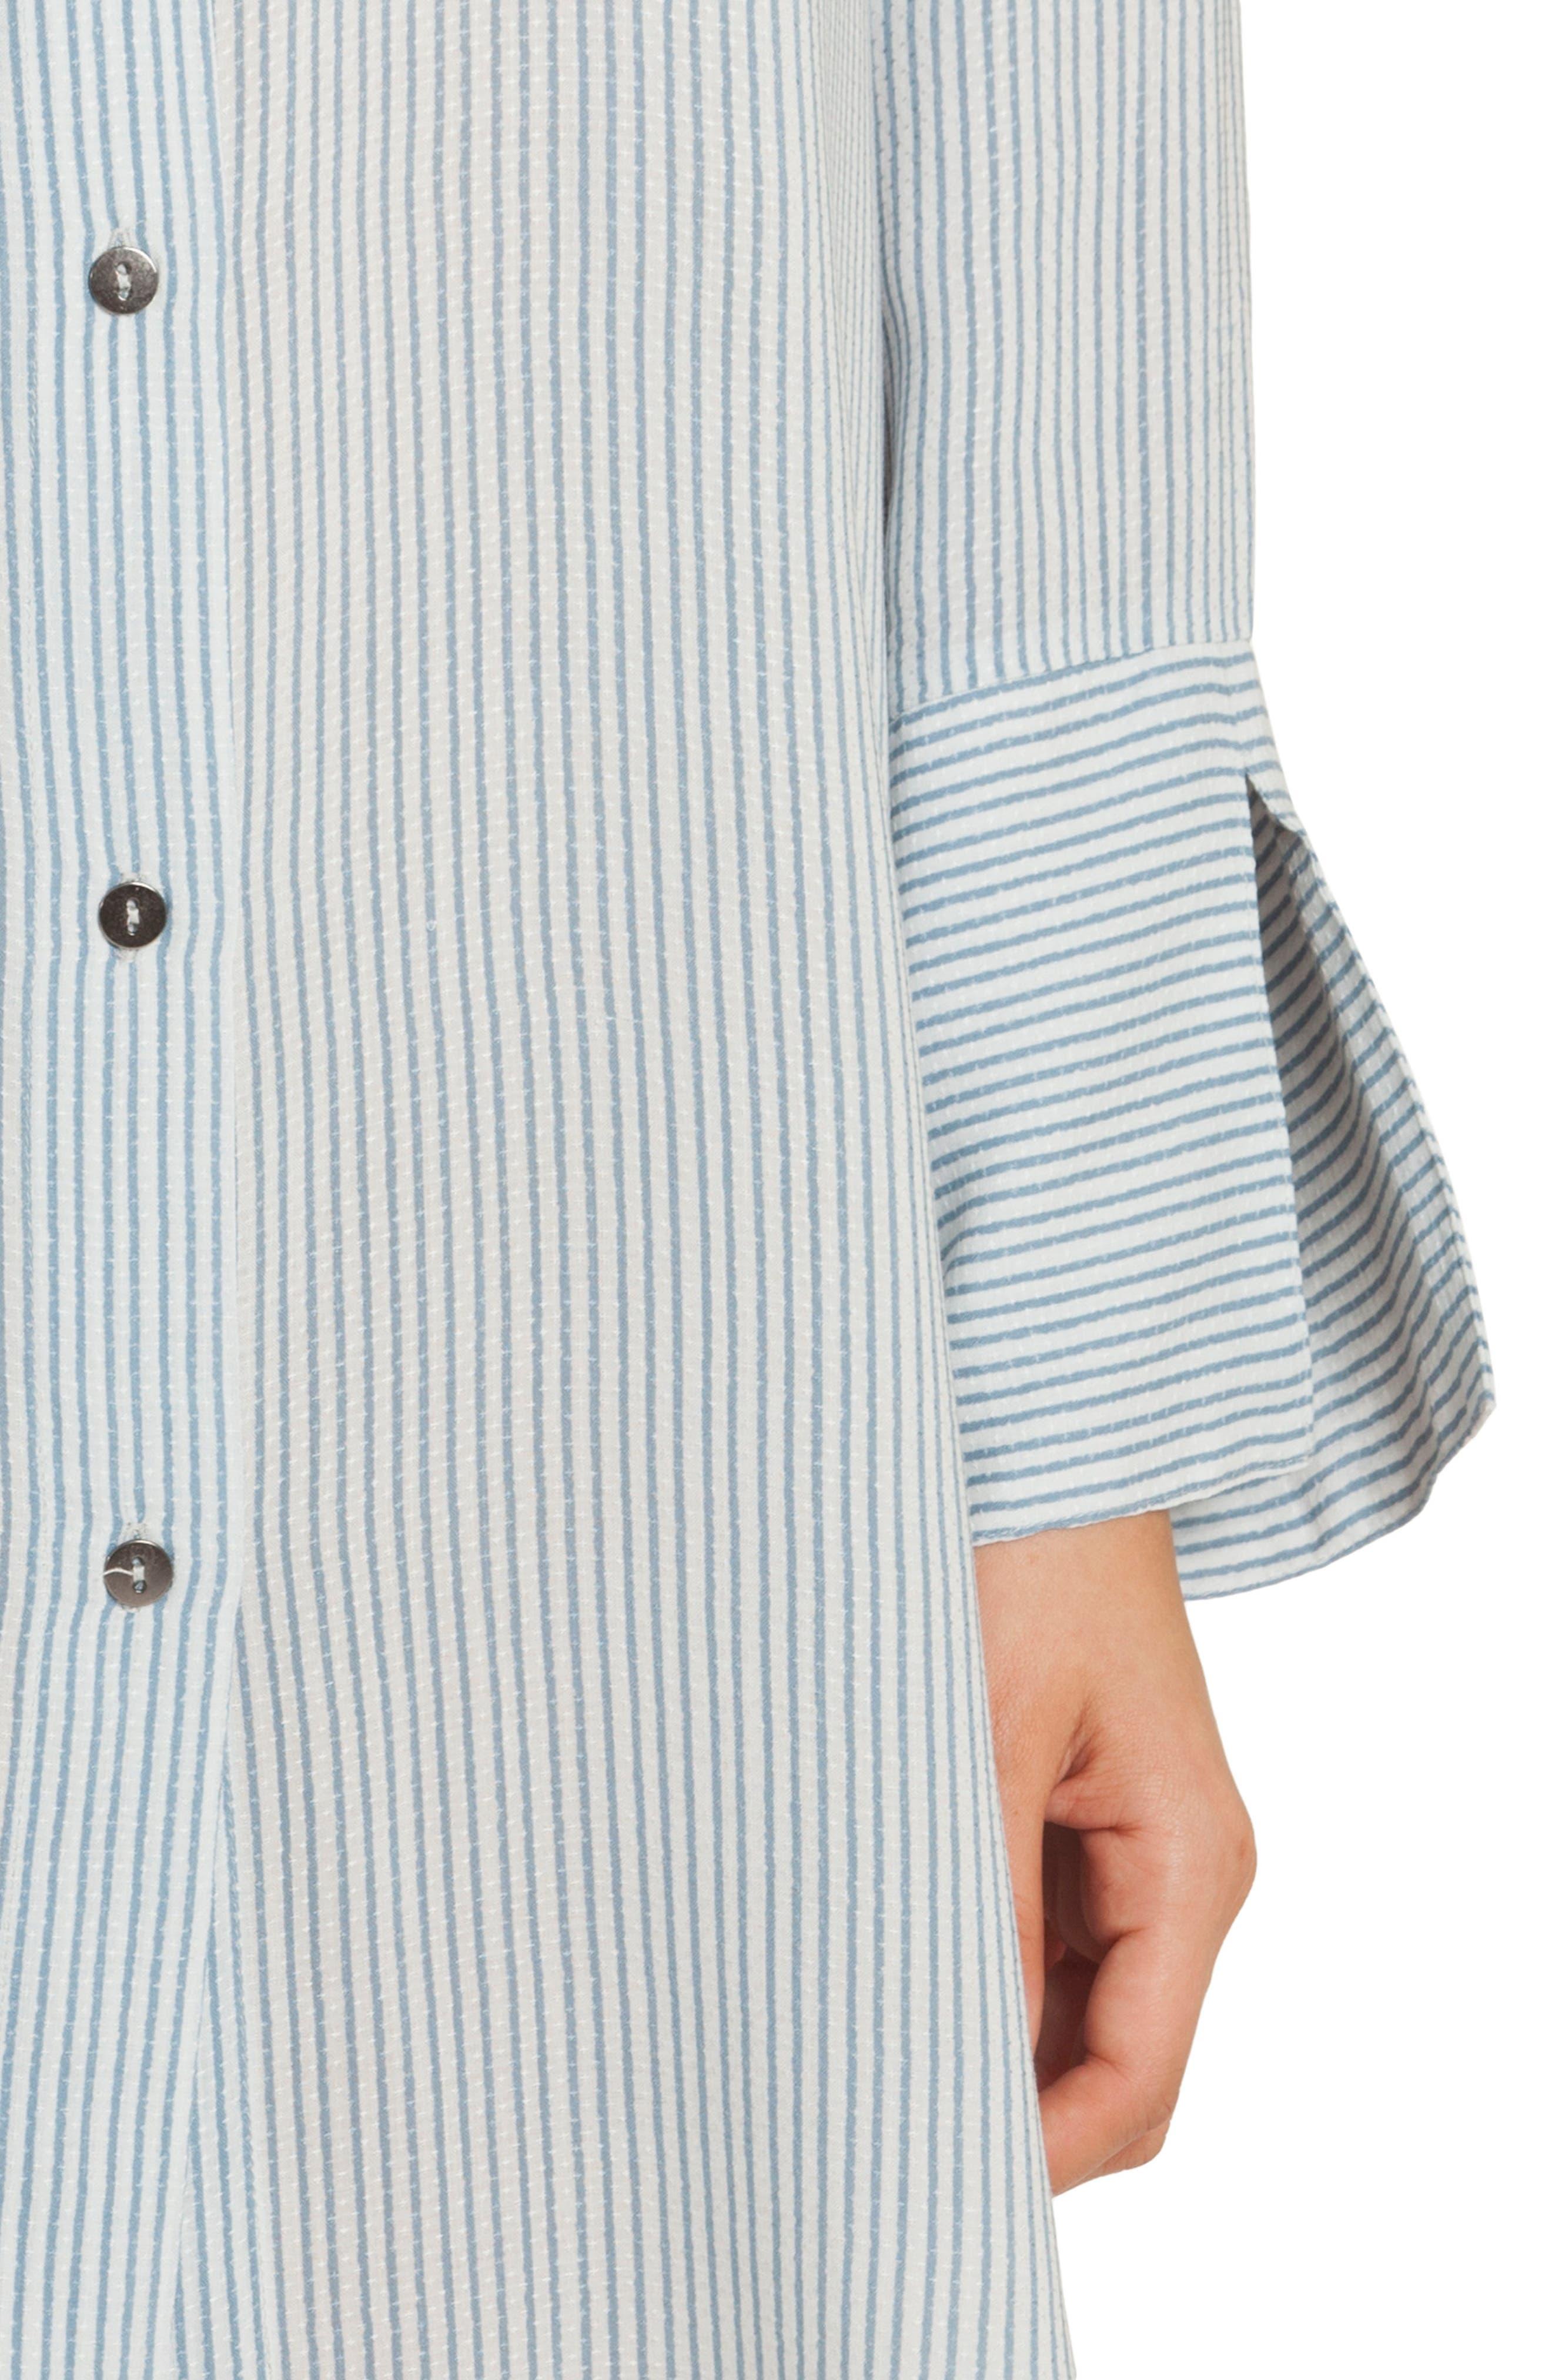 Sleep Shirt,                             Alternate thumbnail 5, color,                             Denim Stripe